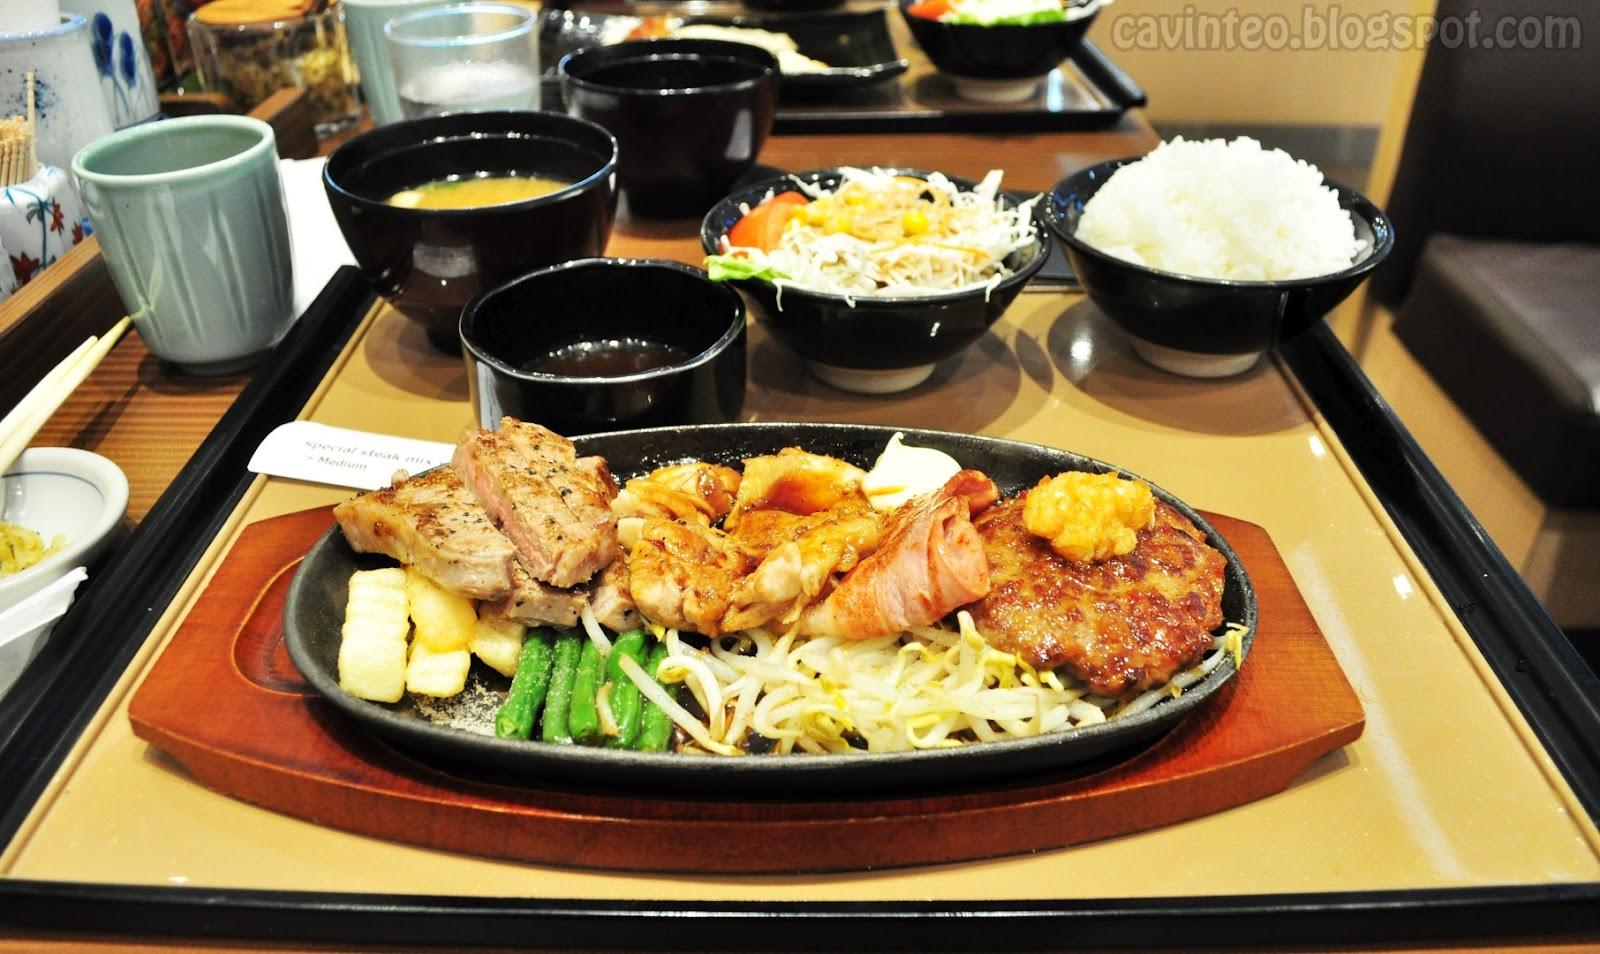 Entree kibbles yayoiken japanese restaurant special for Asian cuisine catering